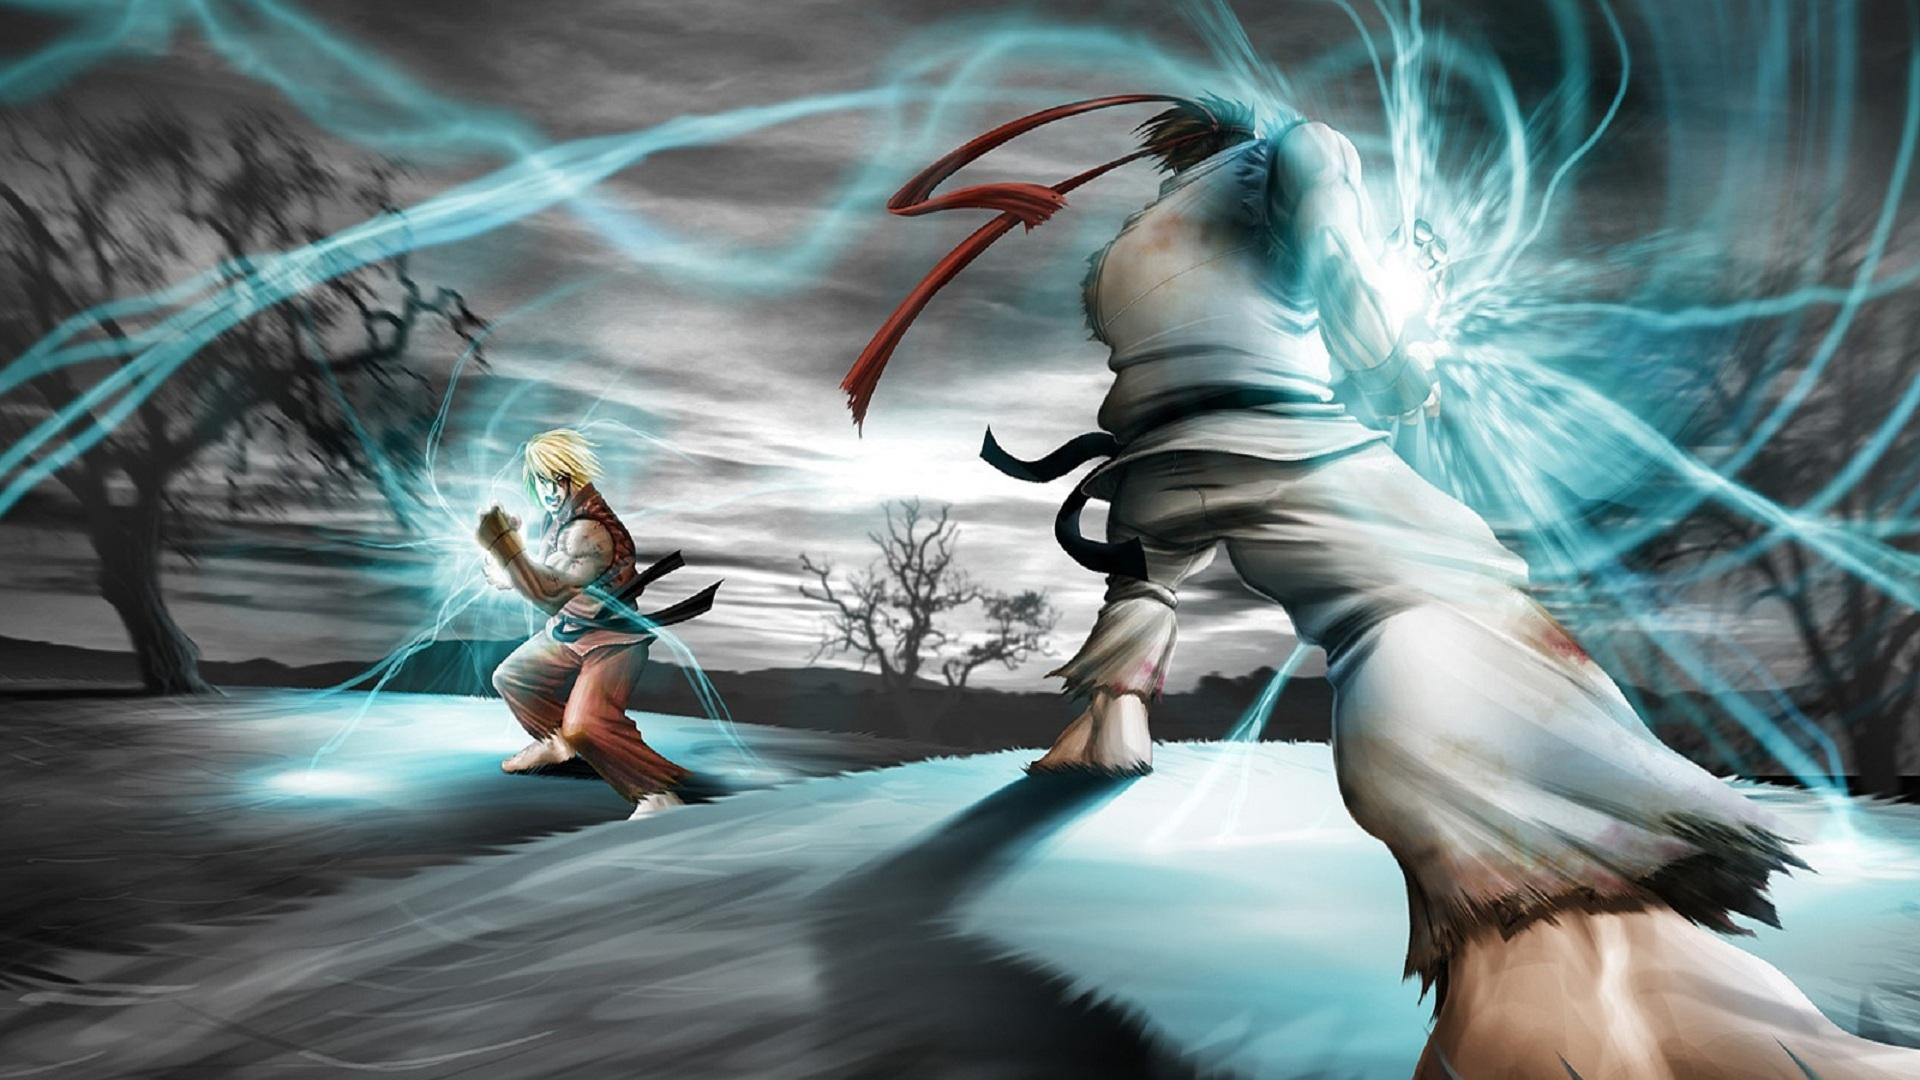 Ryu Vs Ken Wallpaper Sf Wallpaper